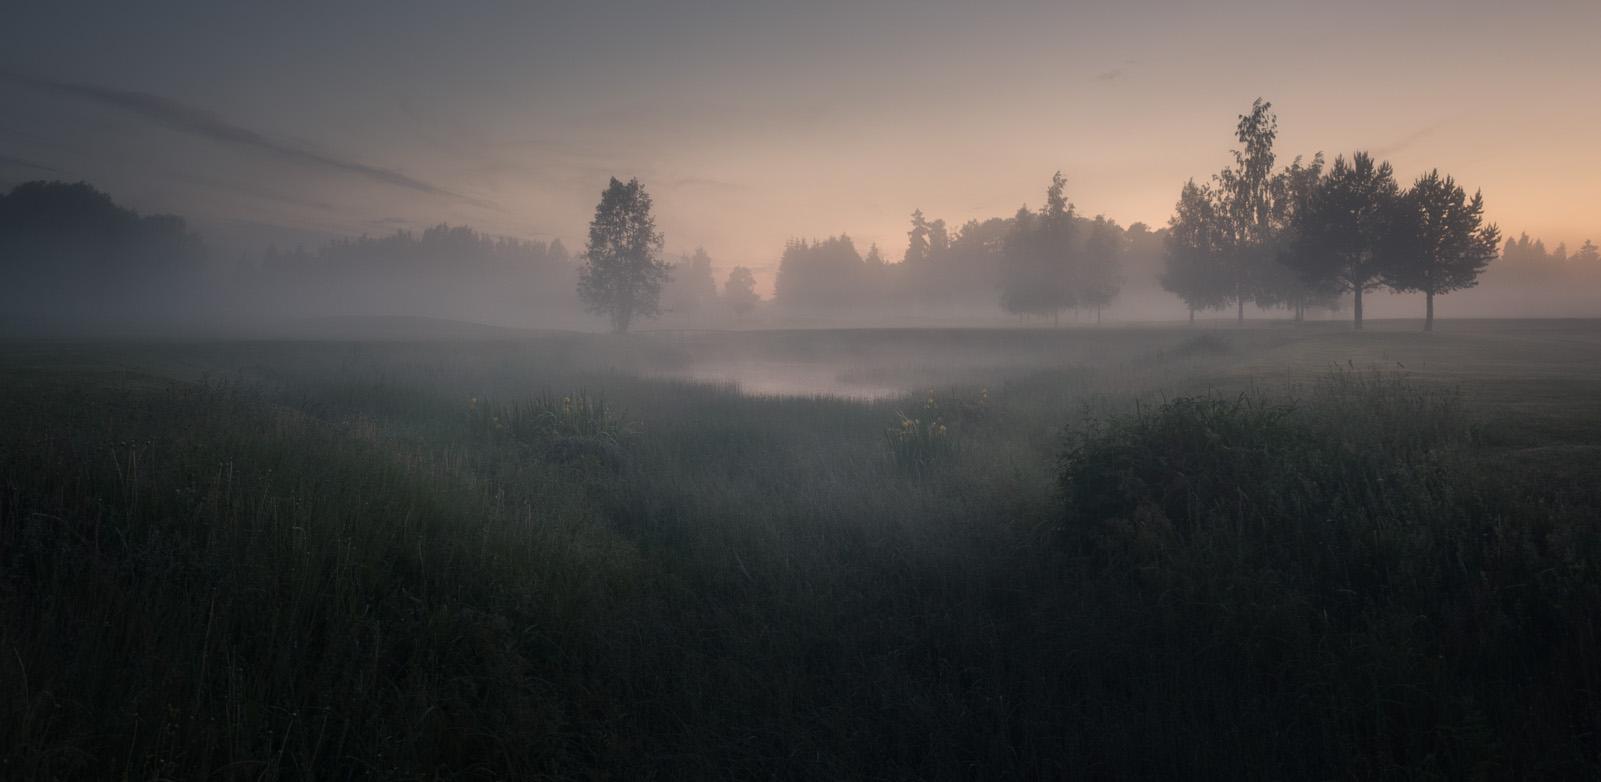 Field of Darkness